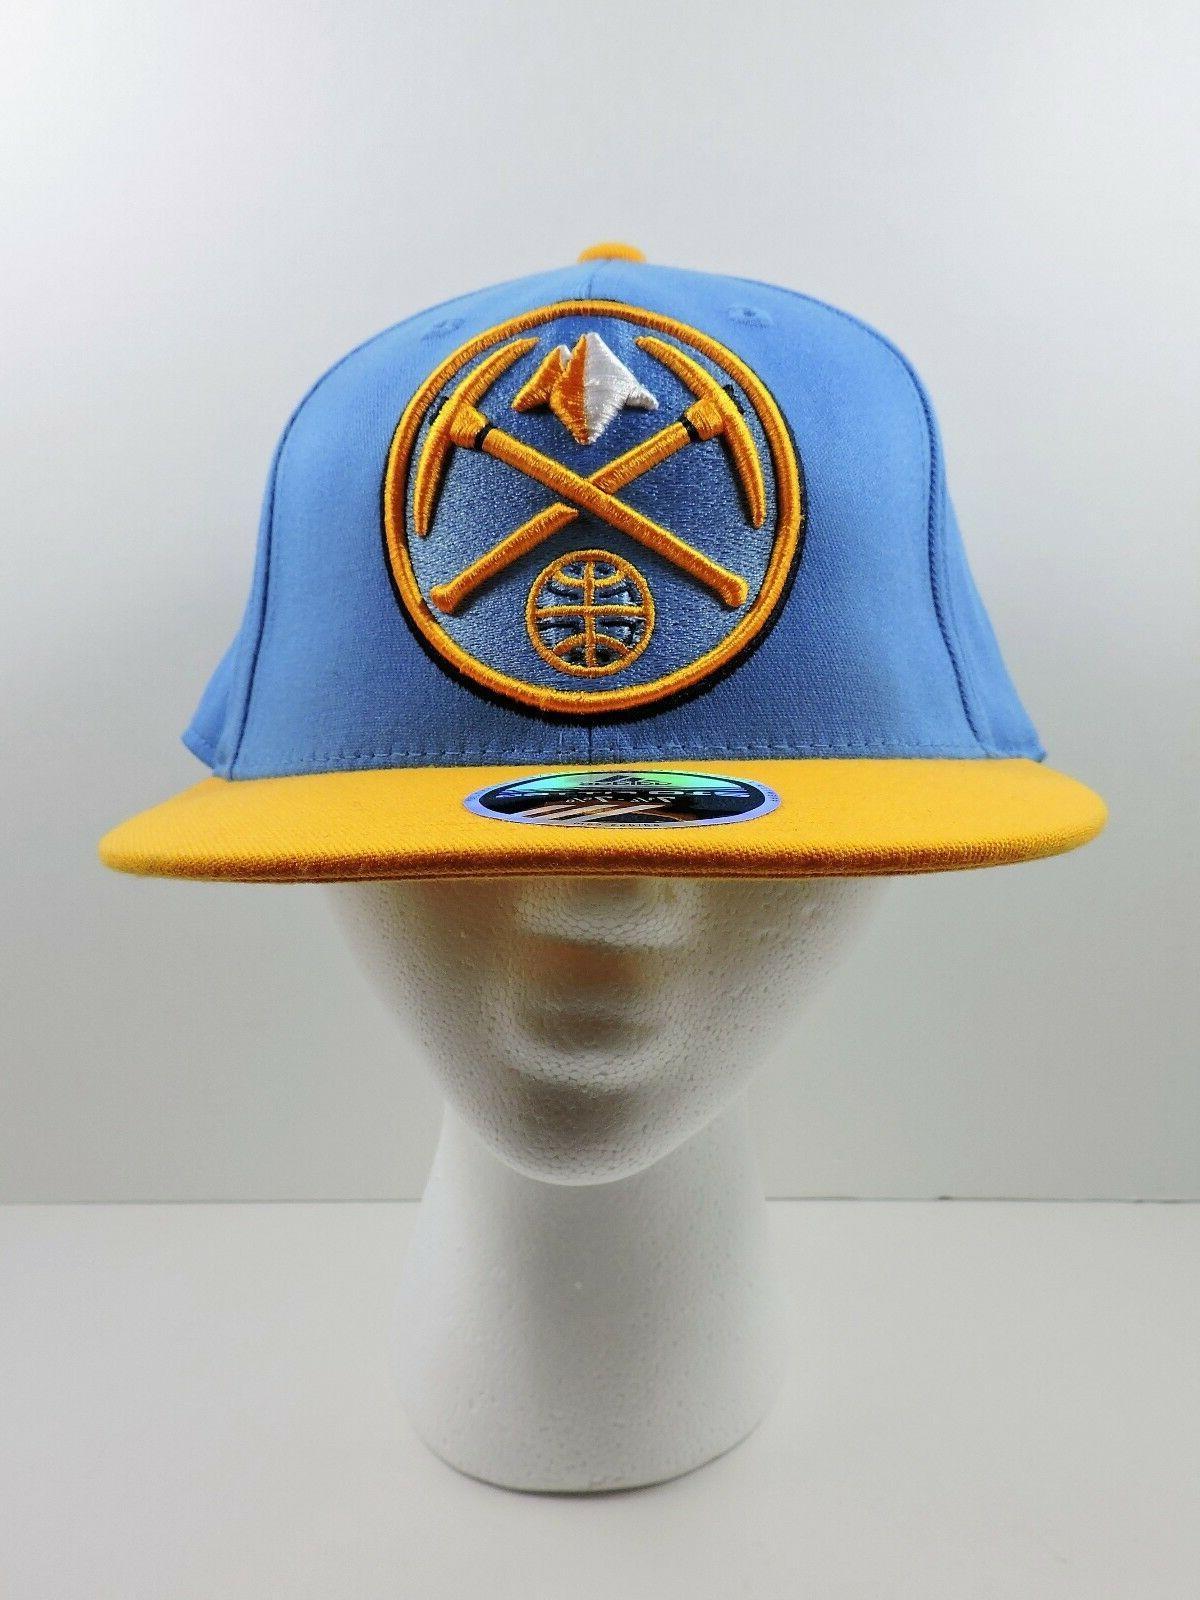 Adidas Denver Basketball Hat 7 1/4 5/8